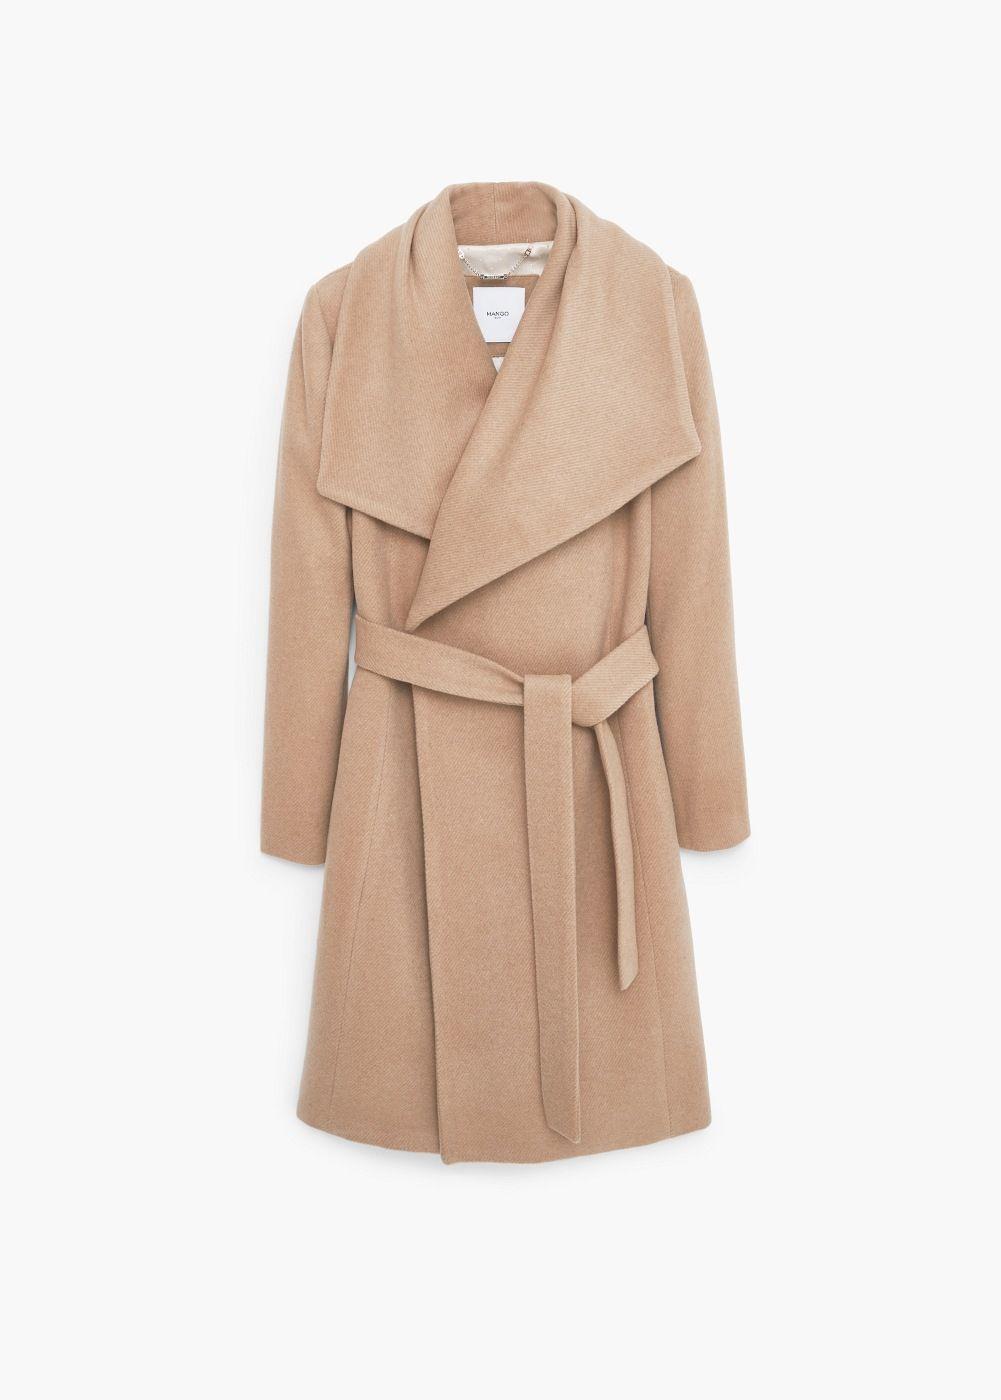 d23b1fffe26ce Lapels wool coat - Trench coat and coats for Women